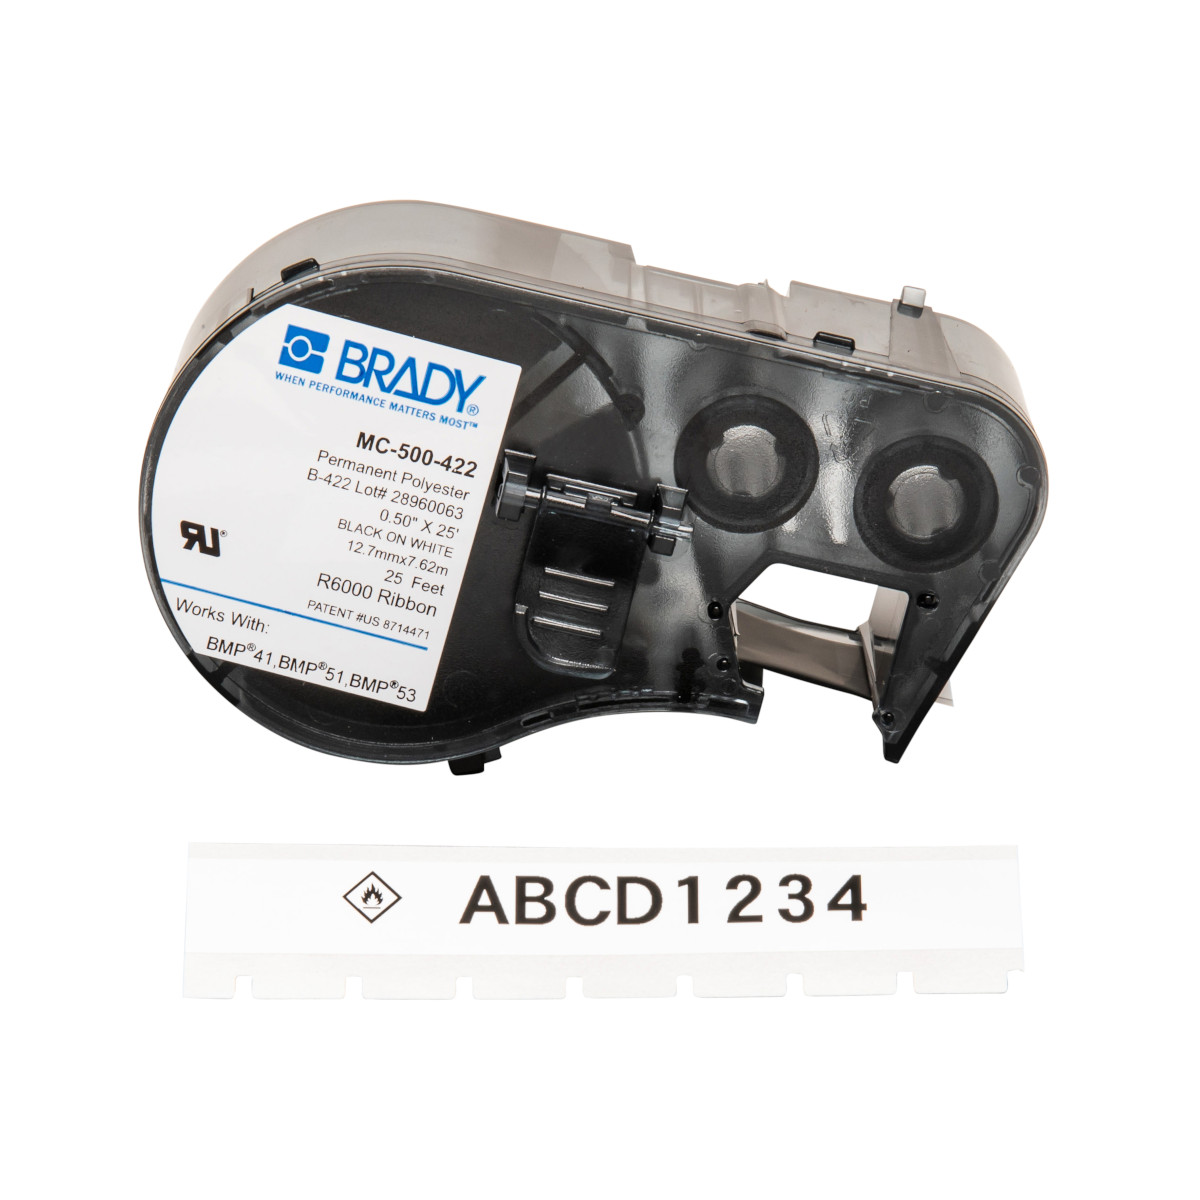 "BRADY MC-500-422 Mseries B422 White0.50""X25' 1 Roll Hf"